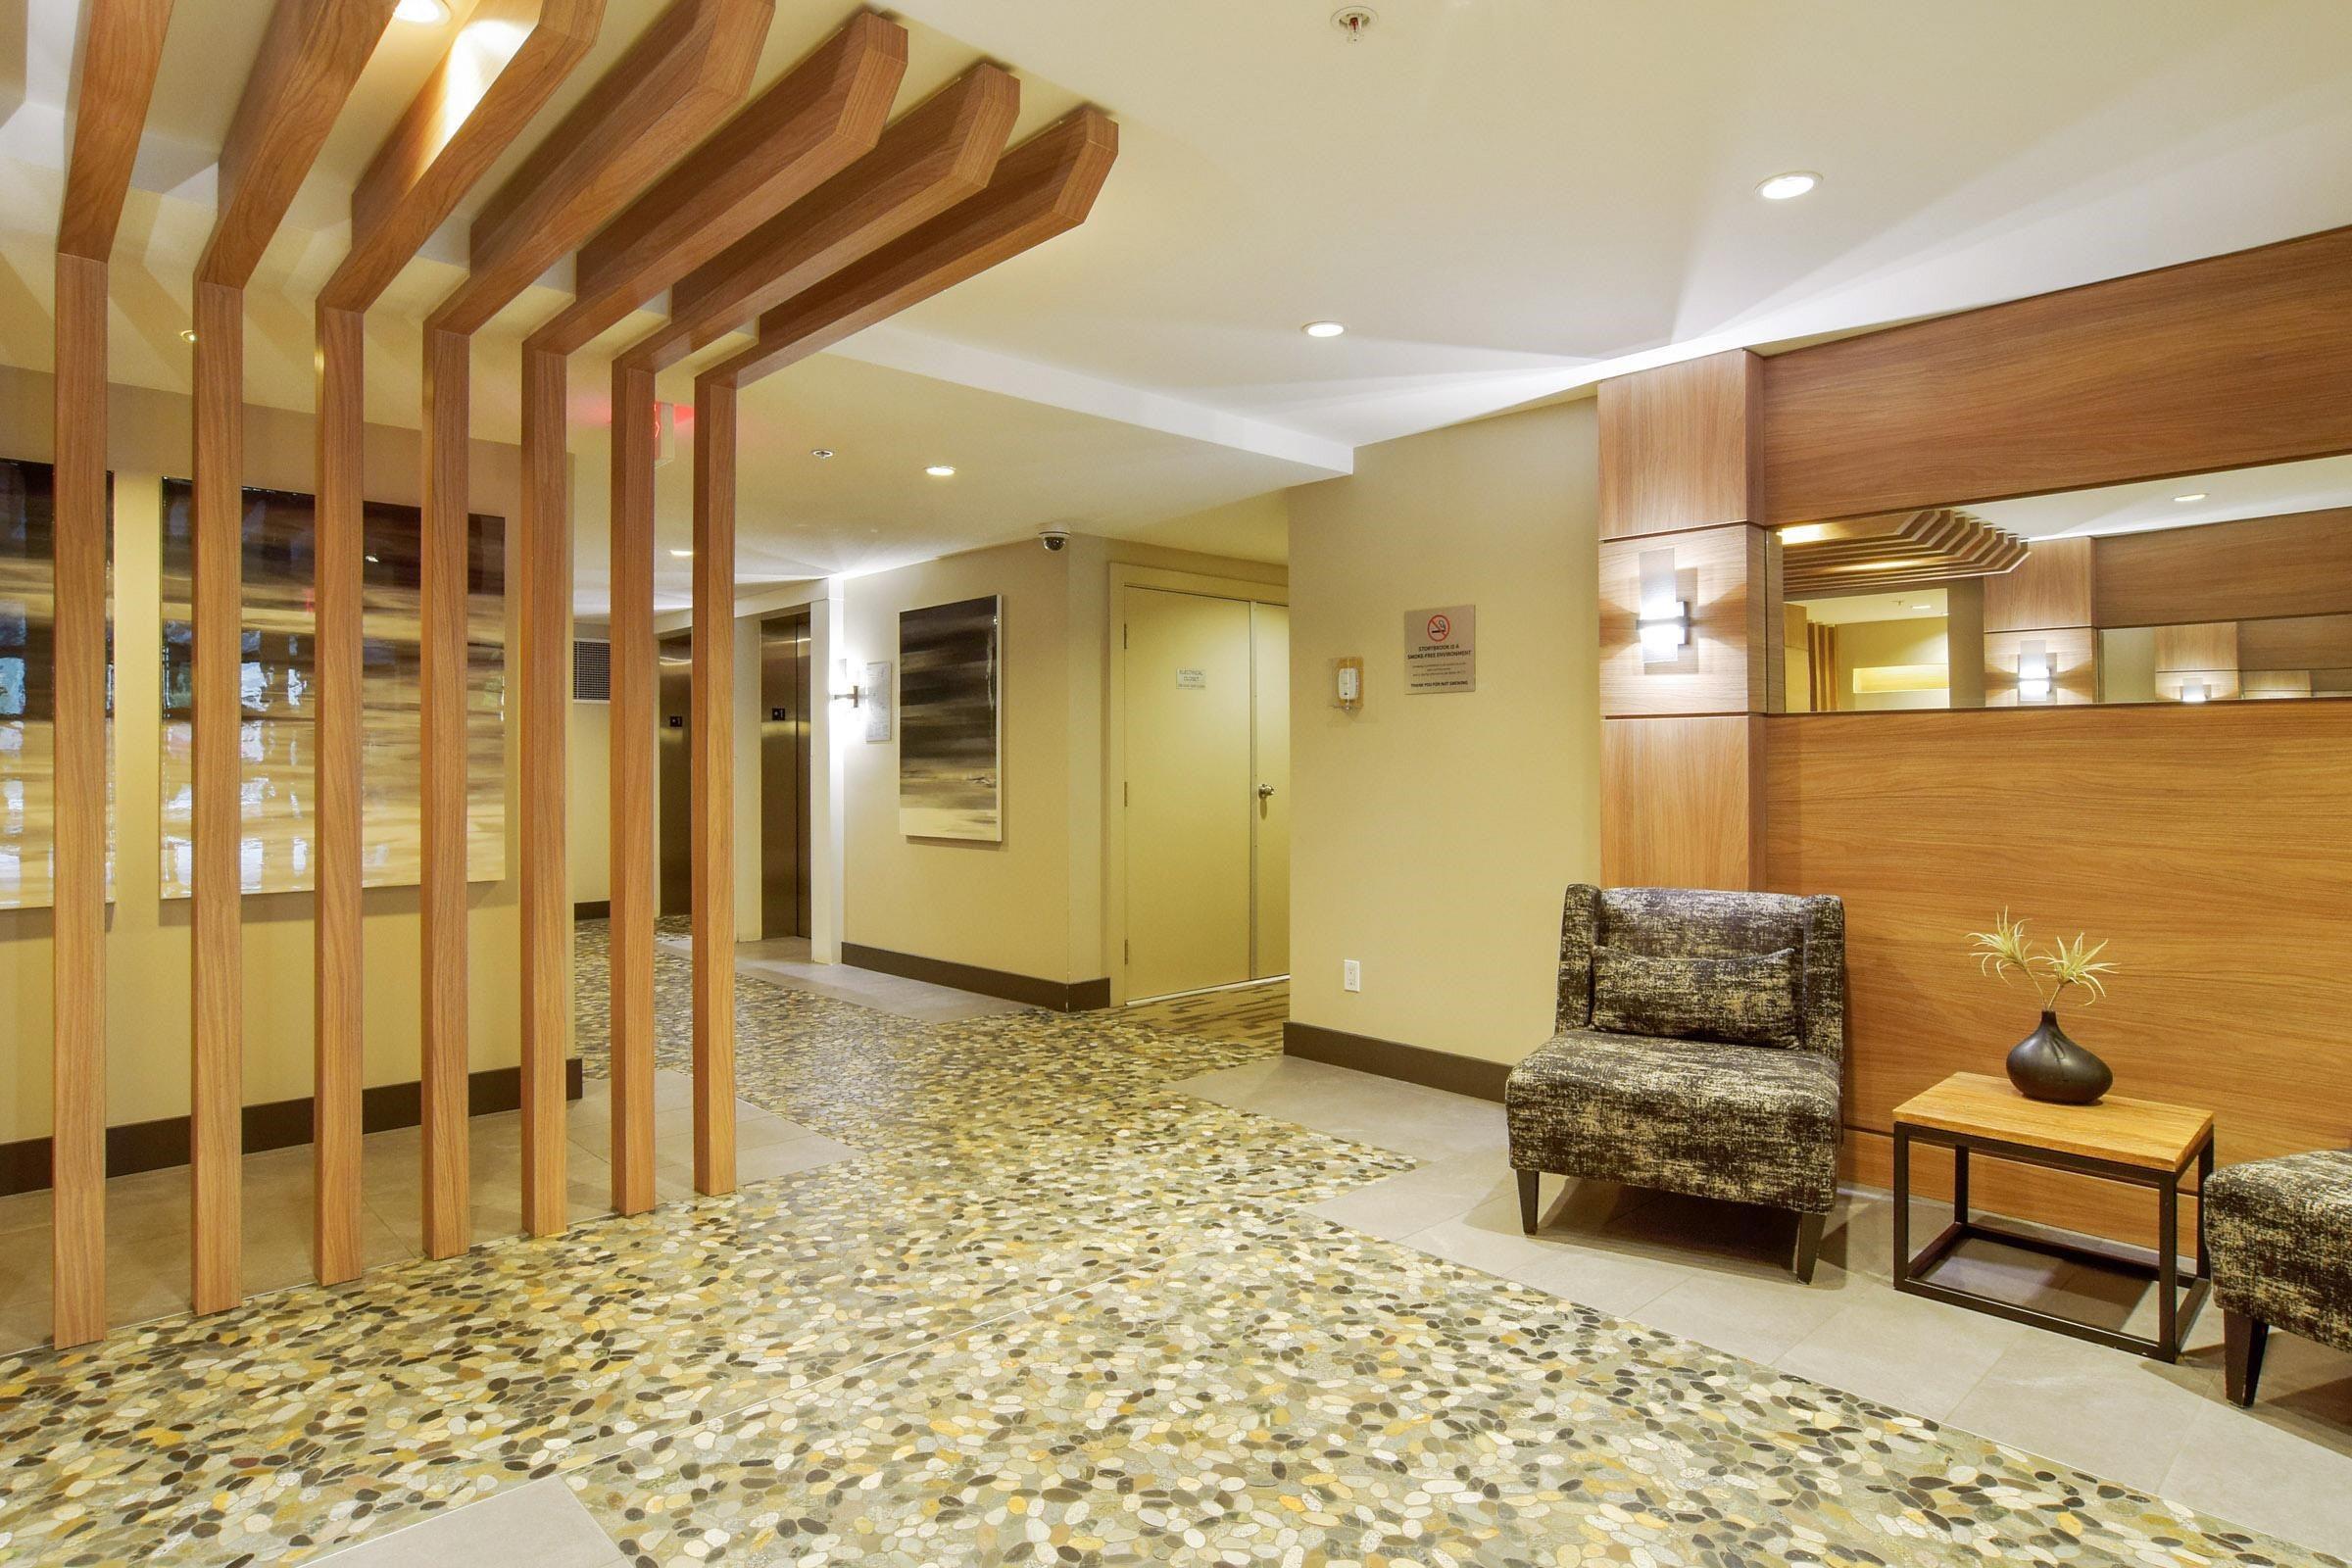 301 7131 STRIDE AVENUE - Edmonds BE Apartment/Condo for sale, 1 Bedroom (R2625669) - #19